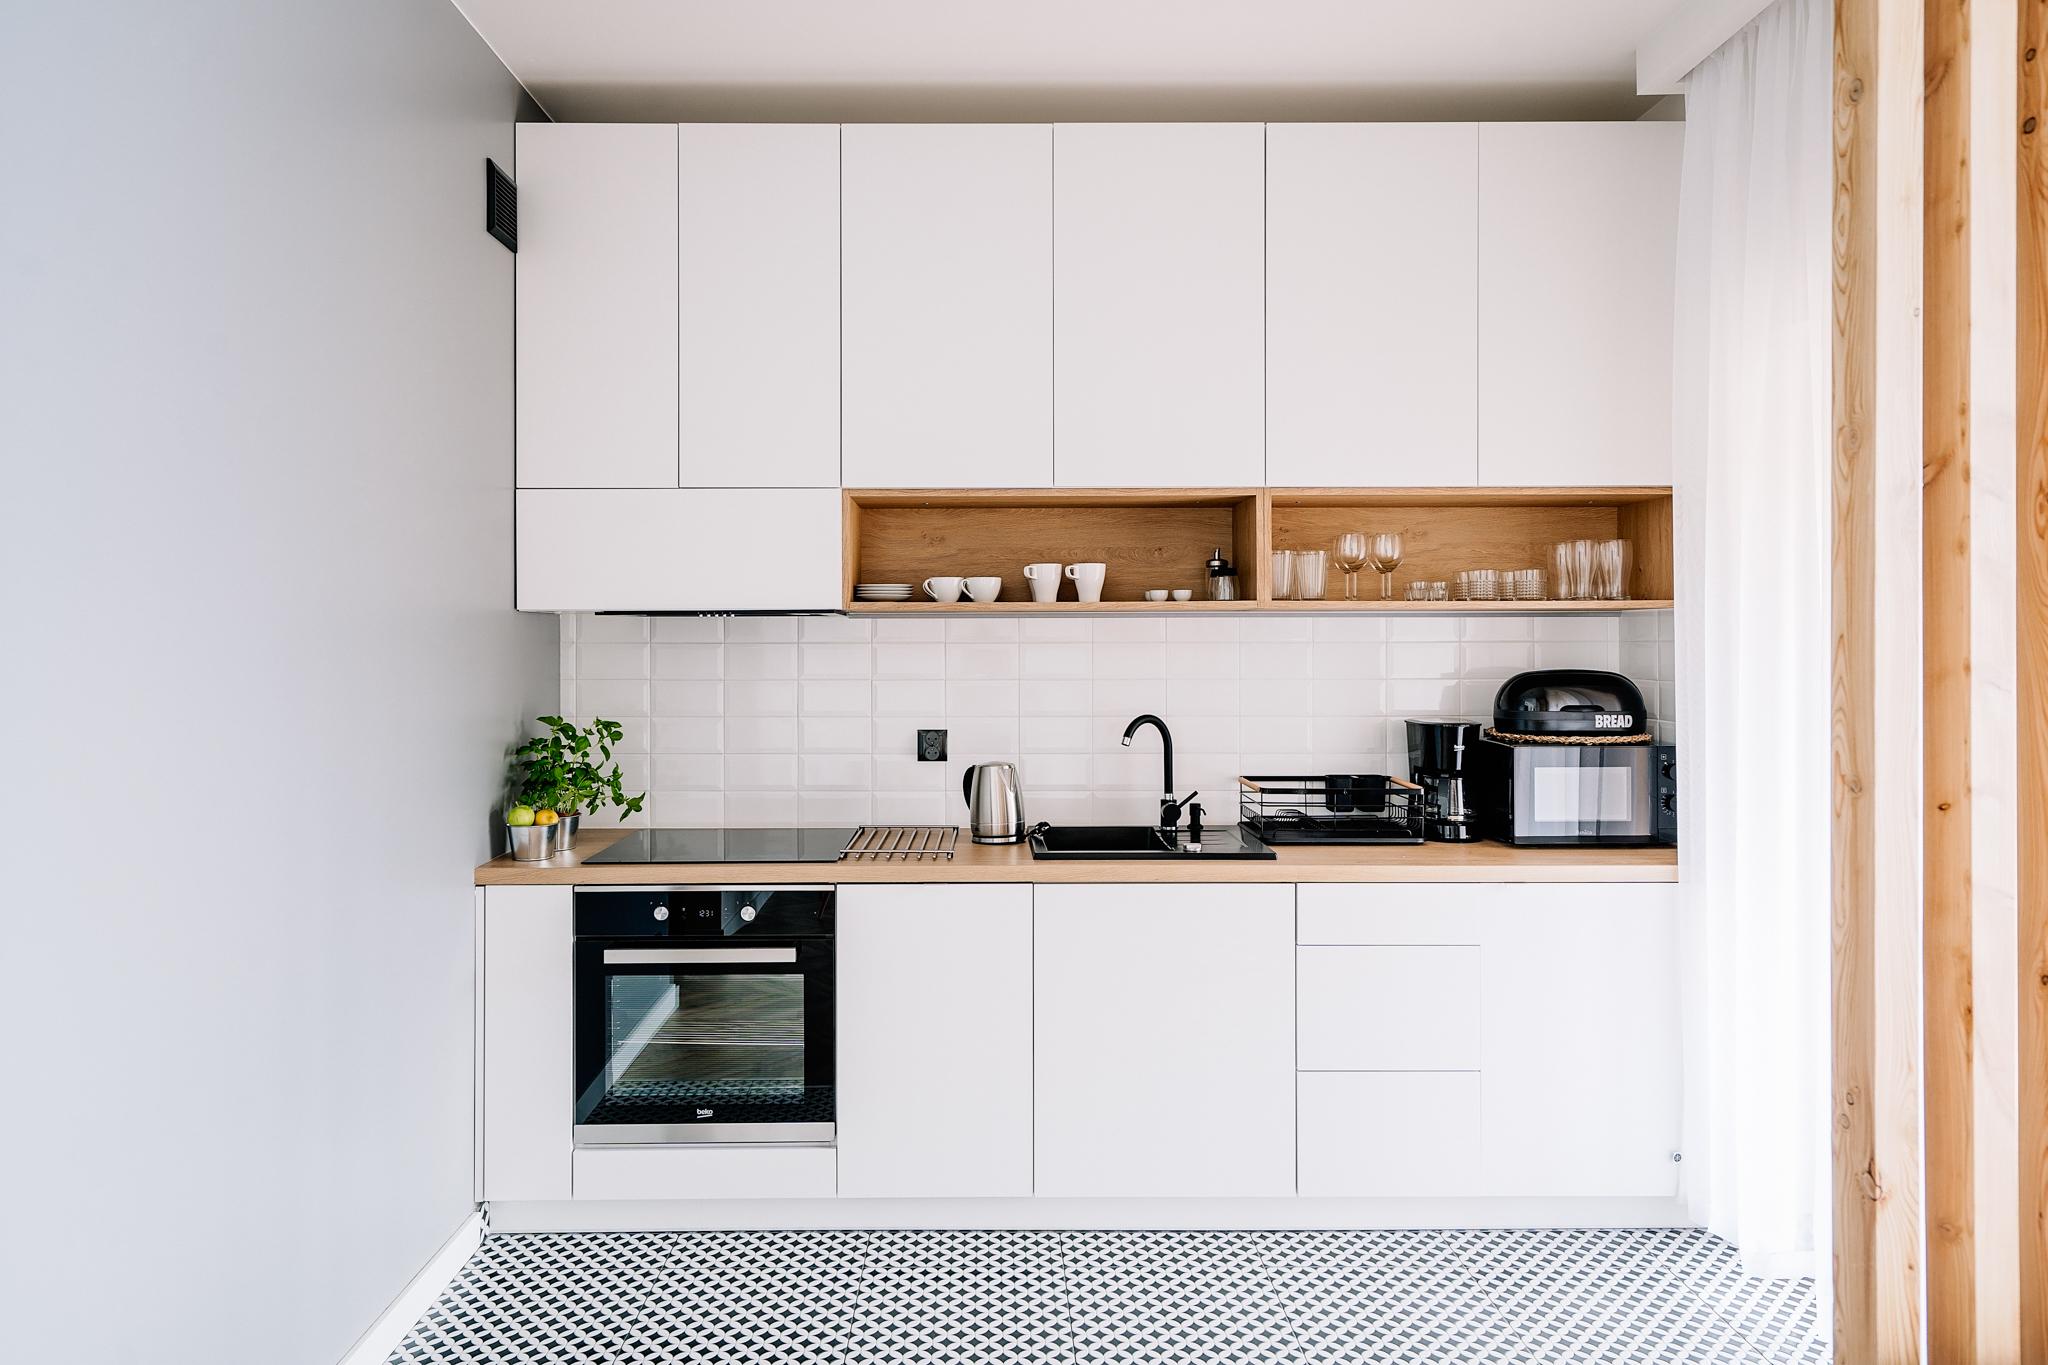 Apartamenty NOVA BIAŁKA Białka Tatrzańska apartament 1 kuchnia